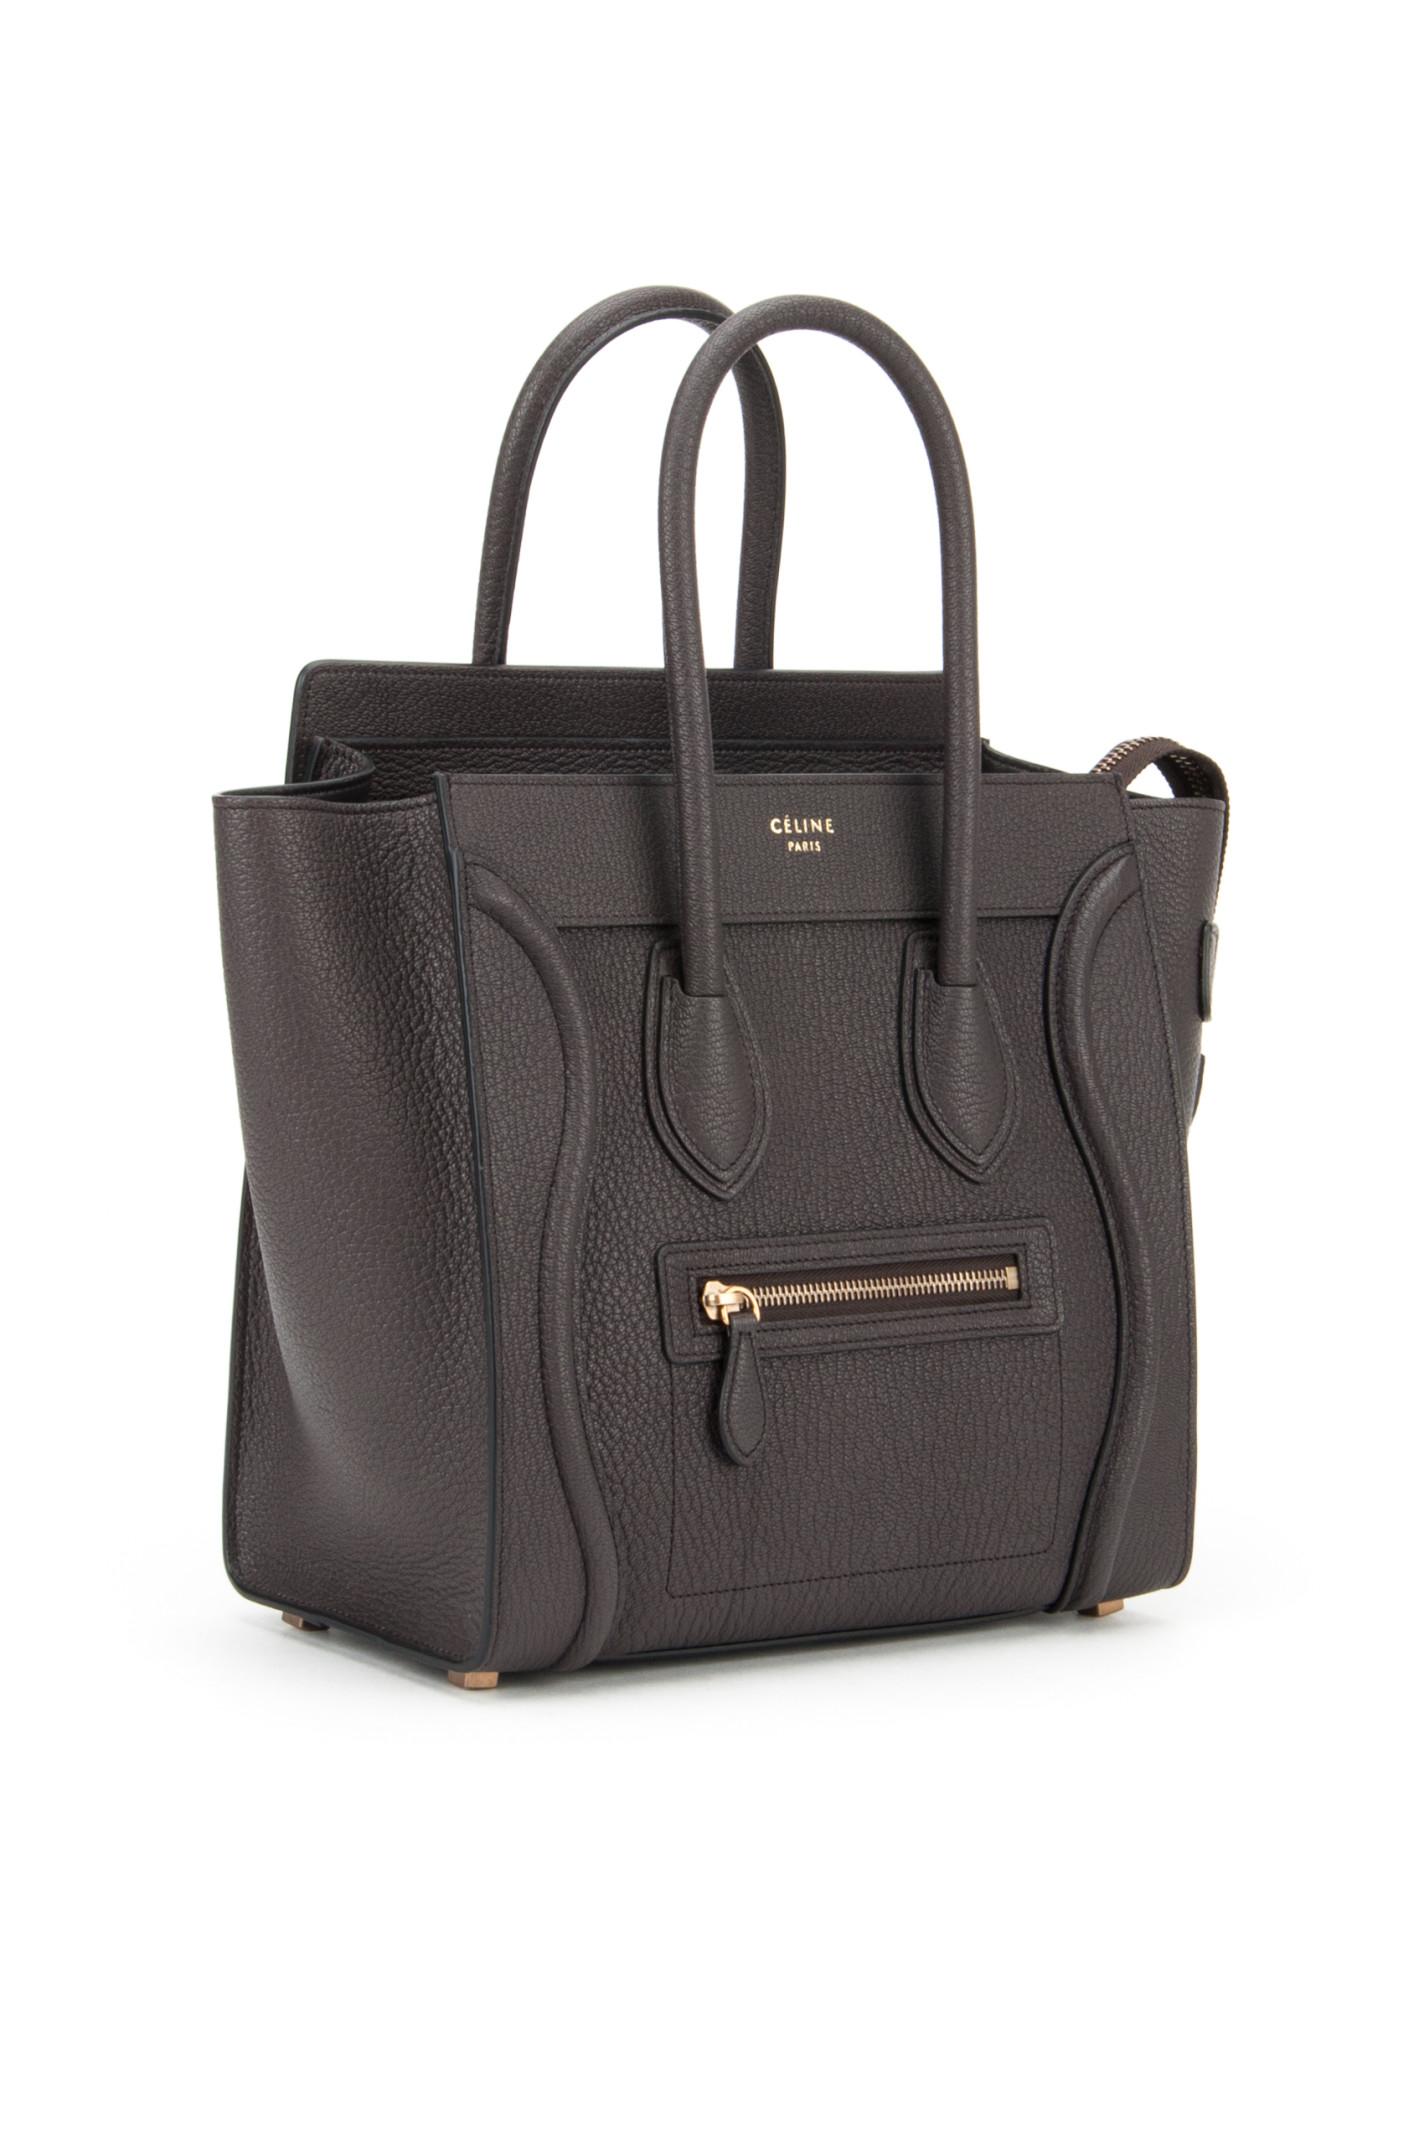 faux croc luggage - celine large dark grey luggage bag, where can i buy celine luggage ...